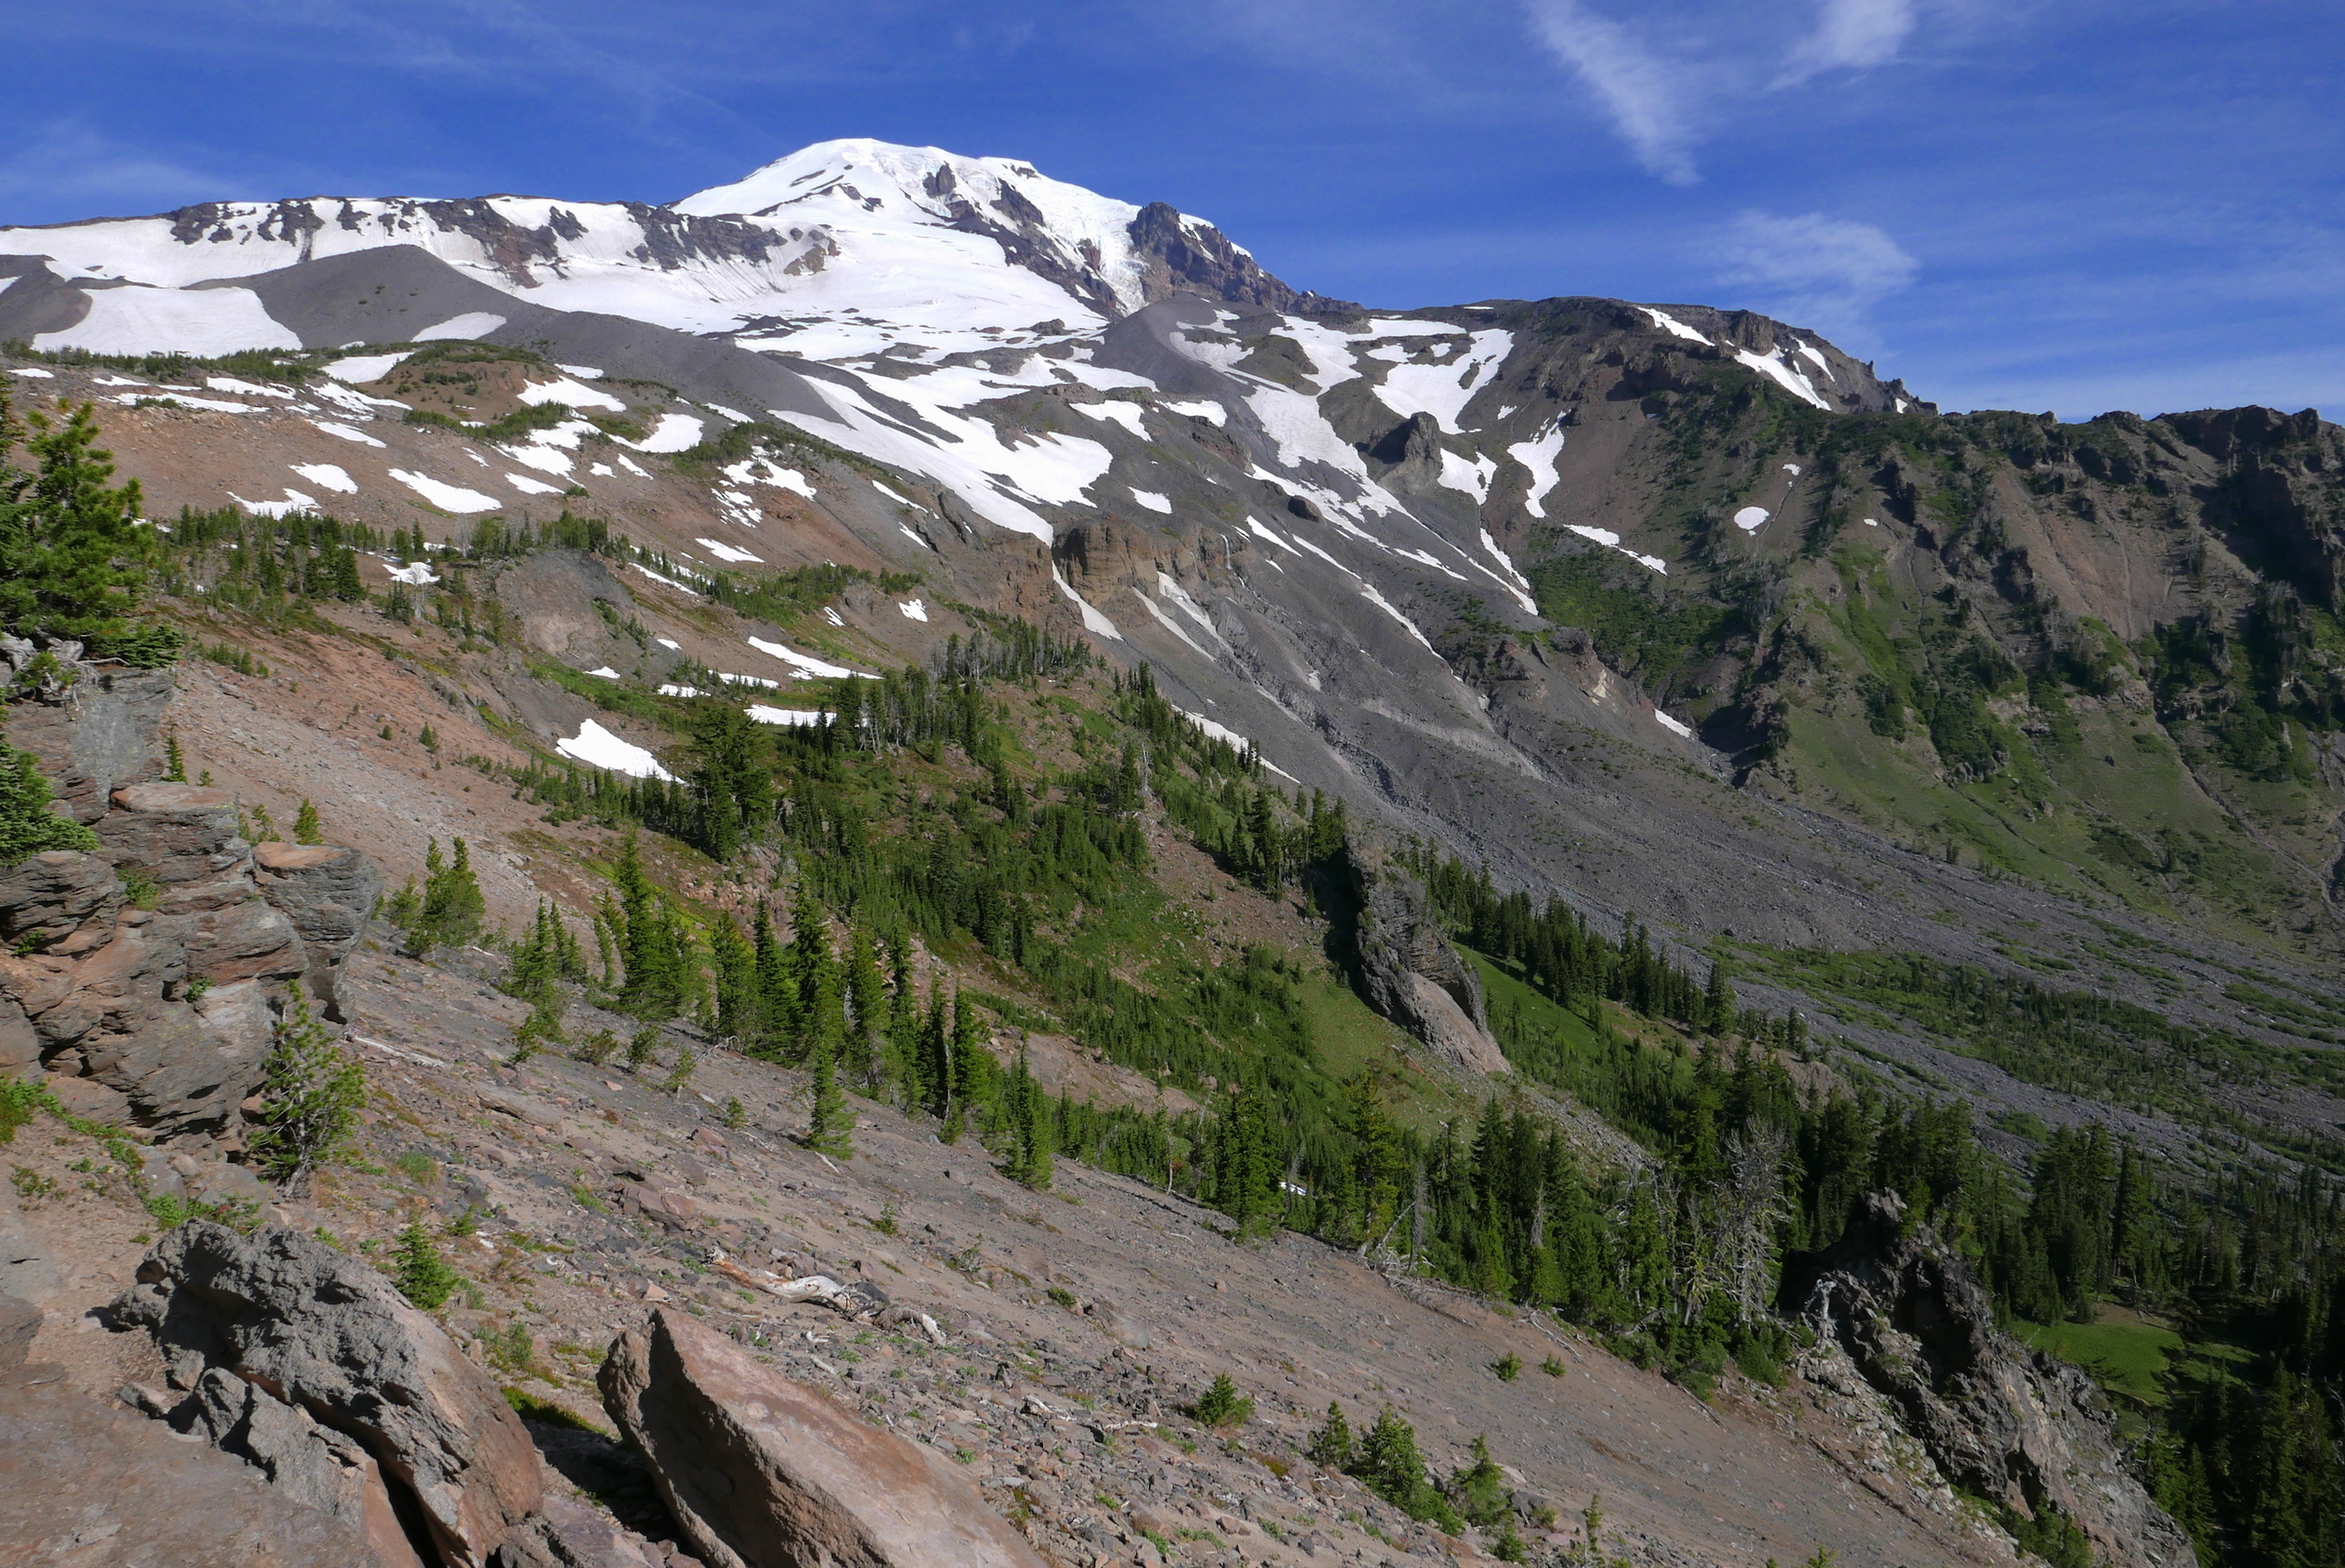 Hellroaring valley, start of off trail, Mt. Adams east side